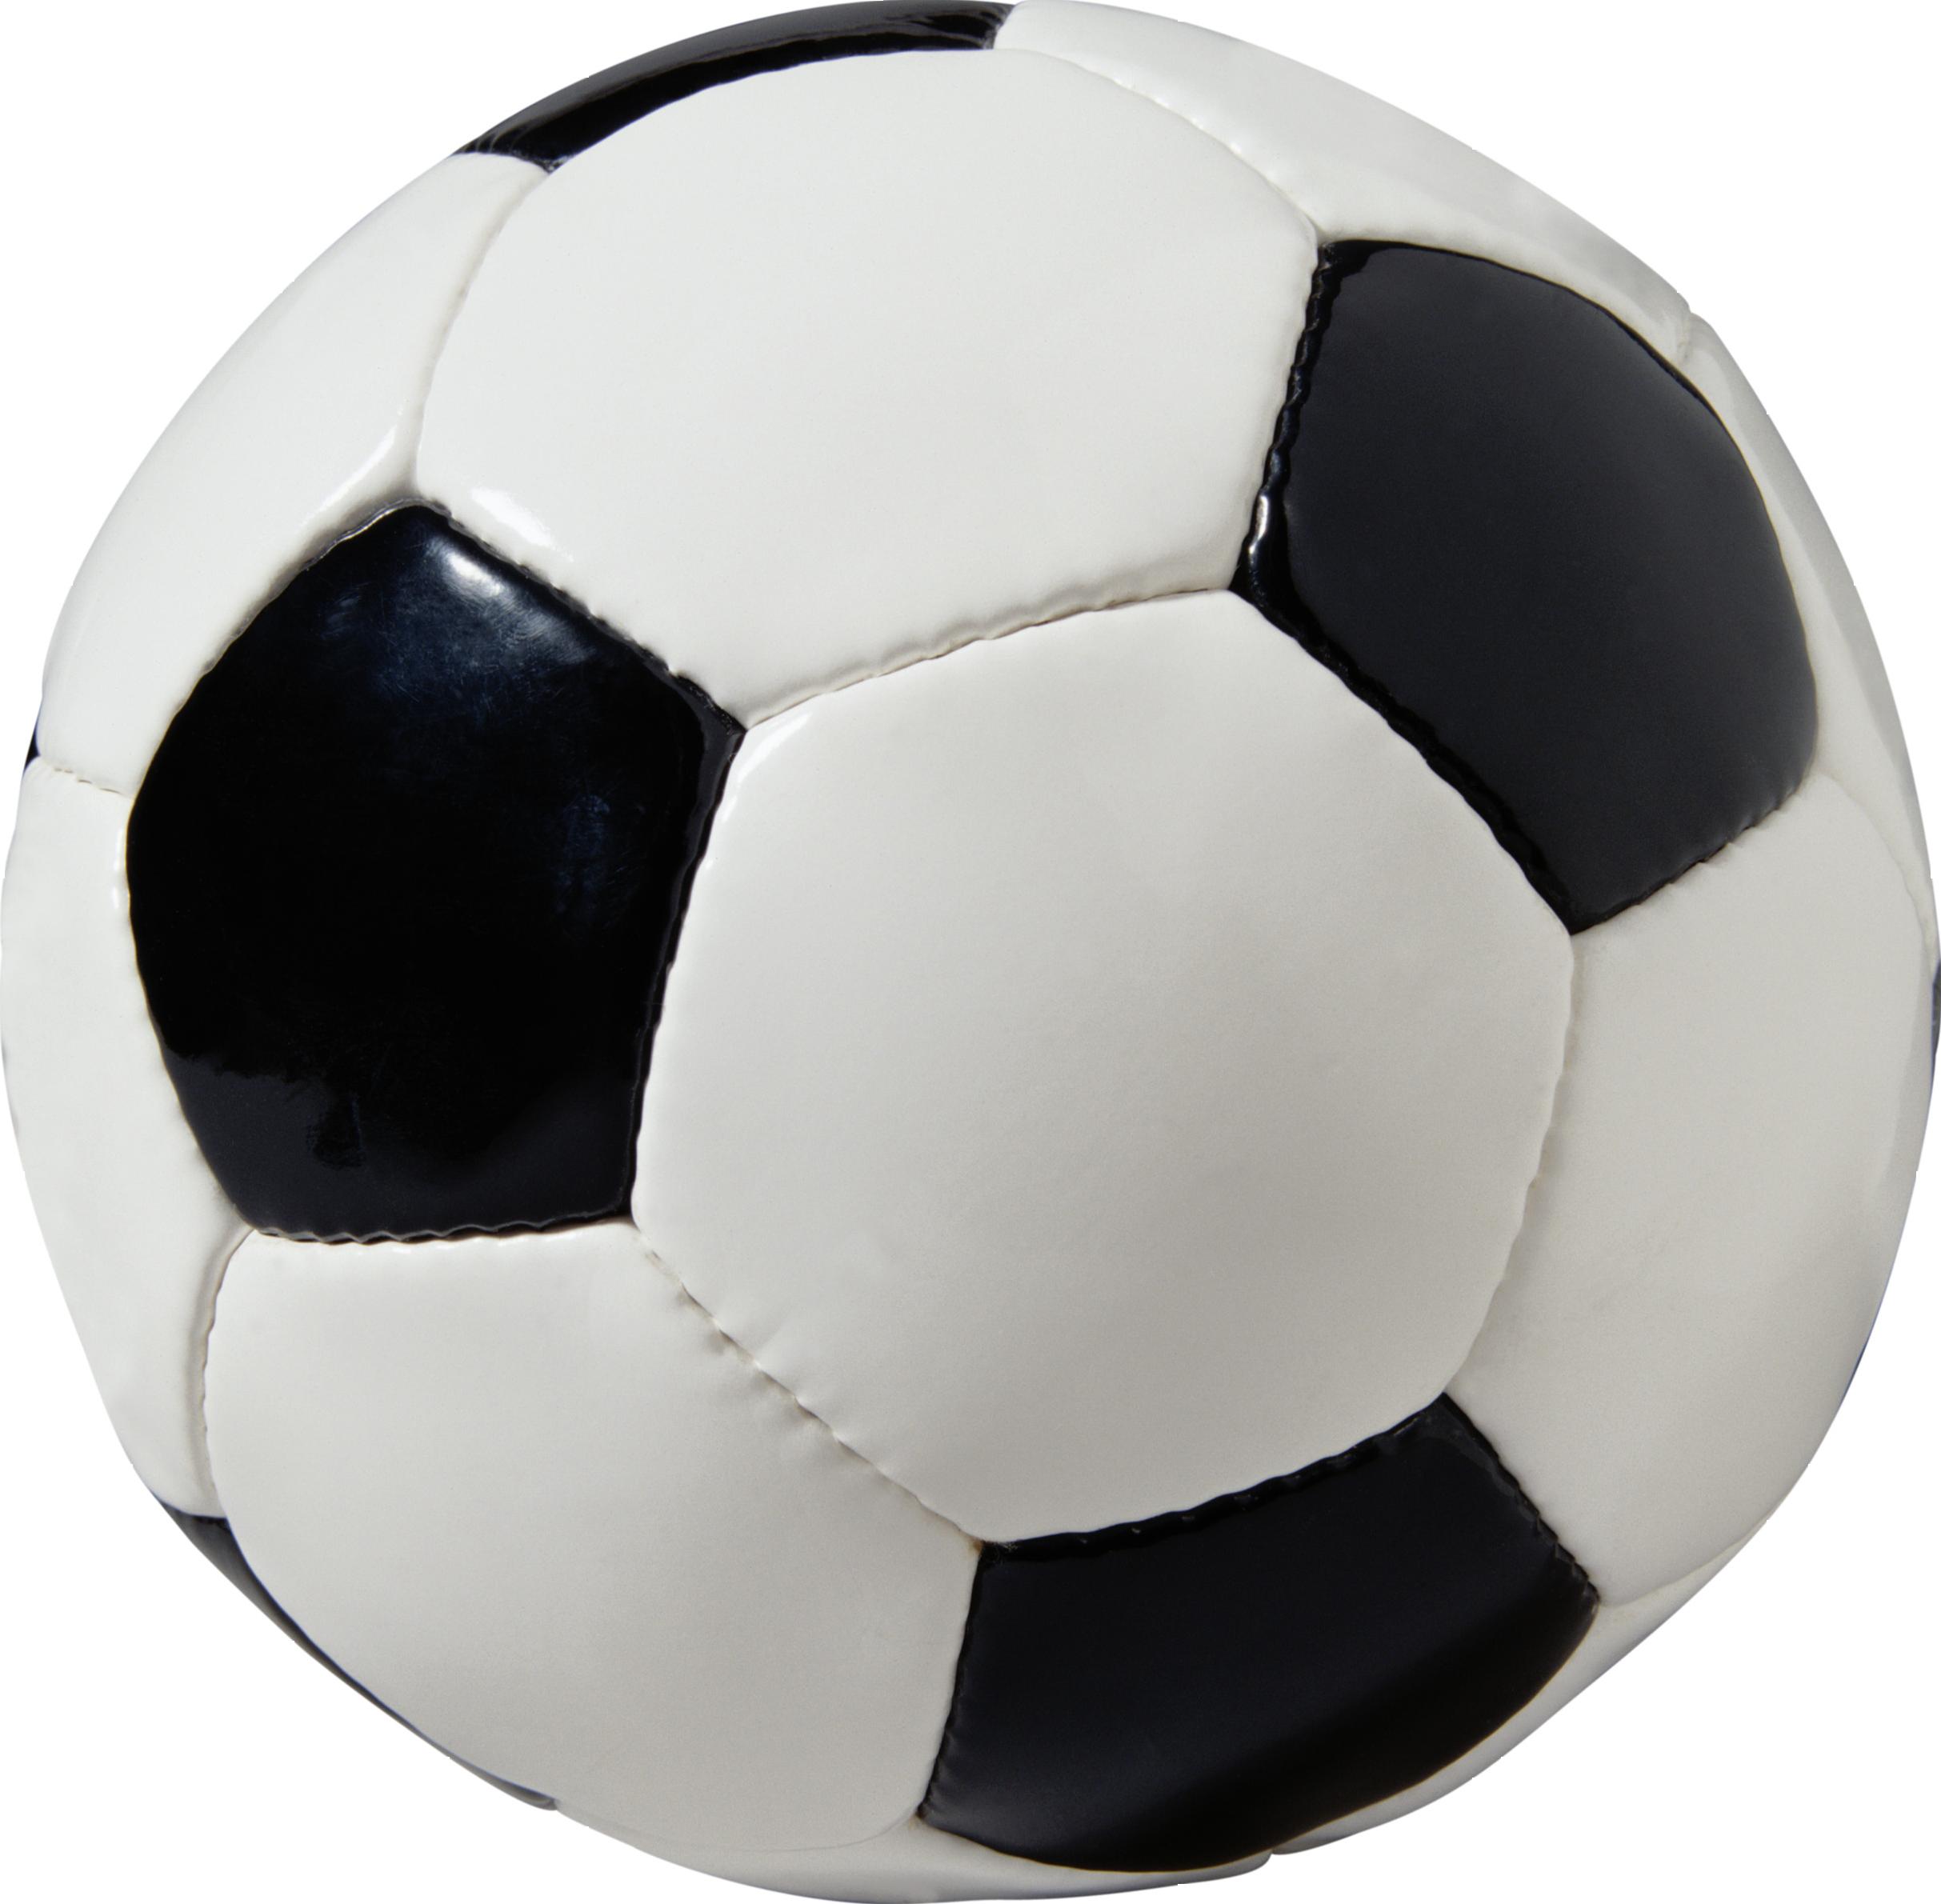 Football Ball Png Image - Football, Transparent background PNG HD thumbnail